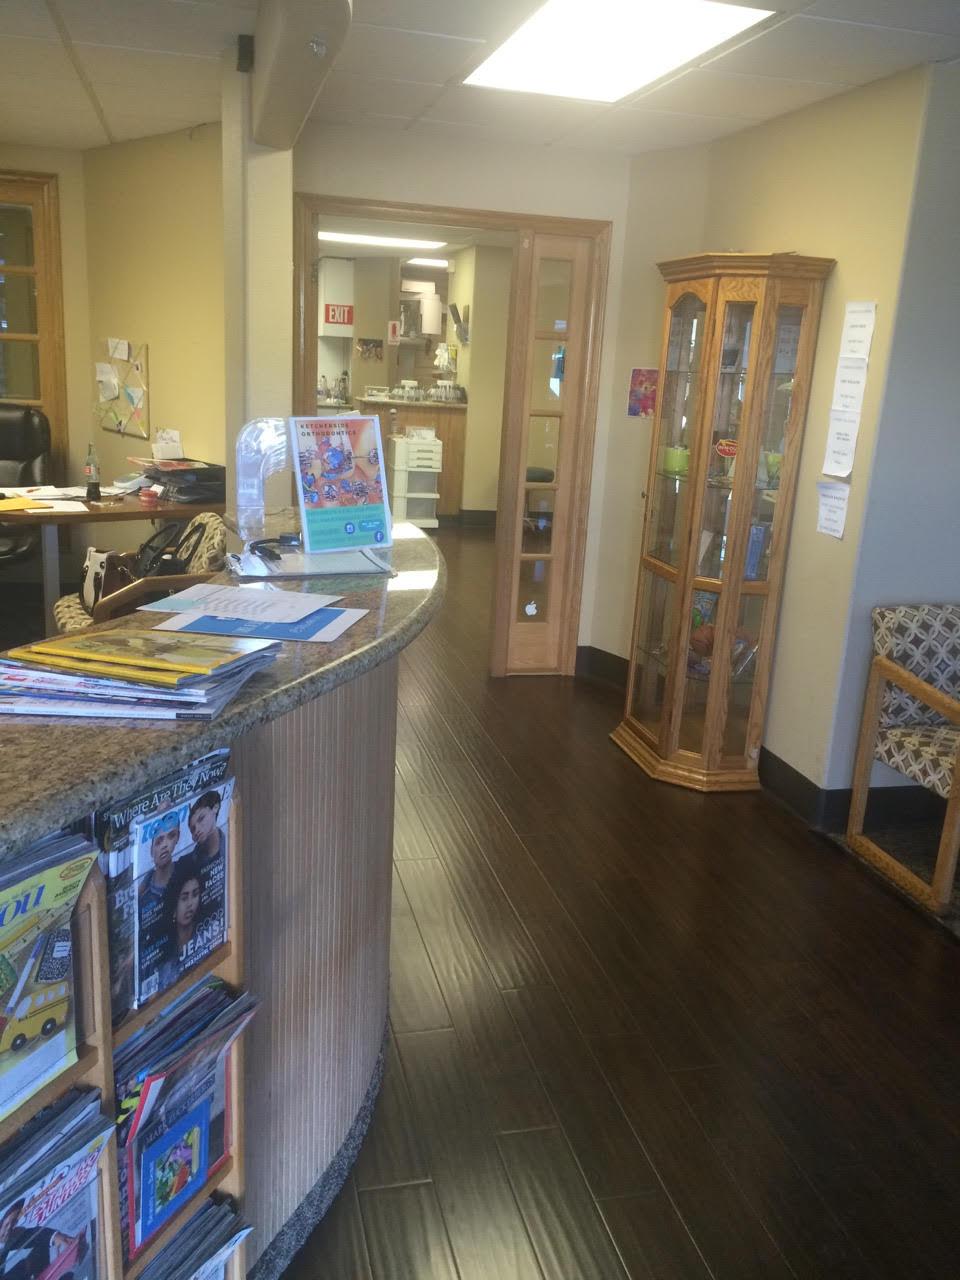 Ketcherside Orthodontics Inc. - dentist  | Photo 6 of 10 | Address: A-, 720 Magnolia Ave #1, Corona, CA 92879, USA | Phone: (951) 737-3800